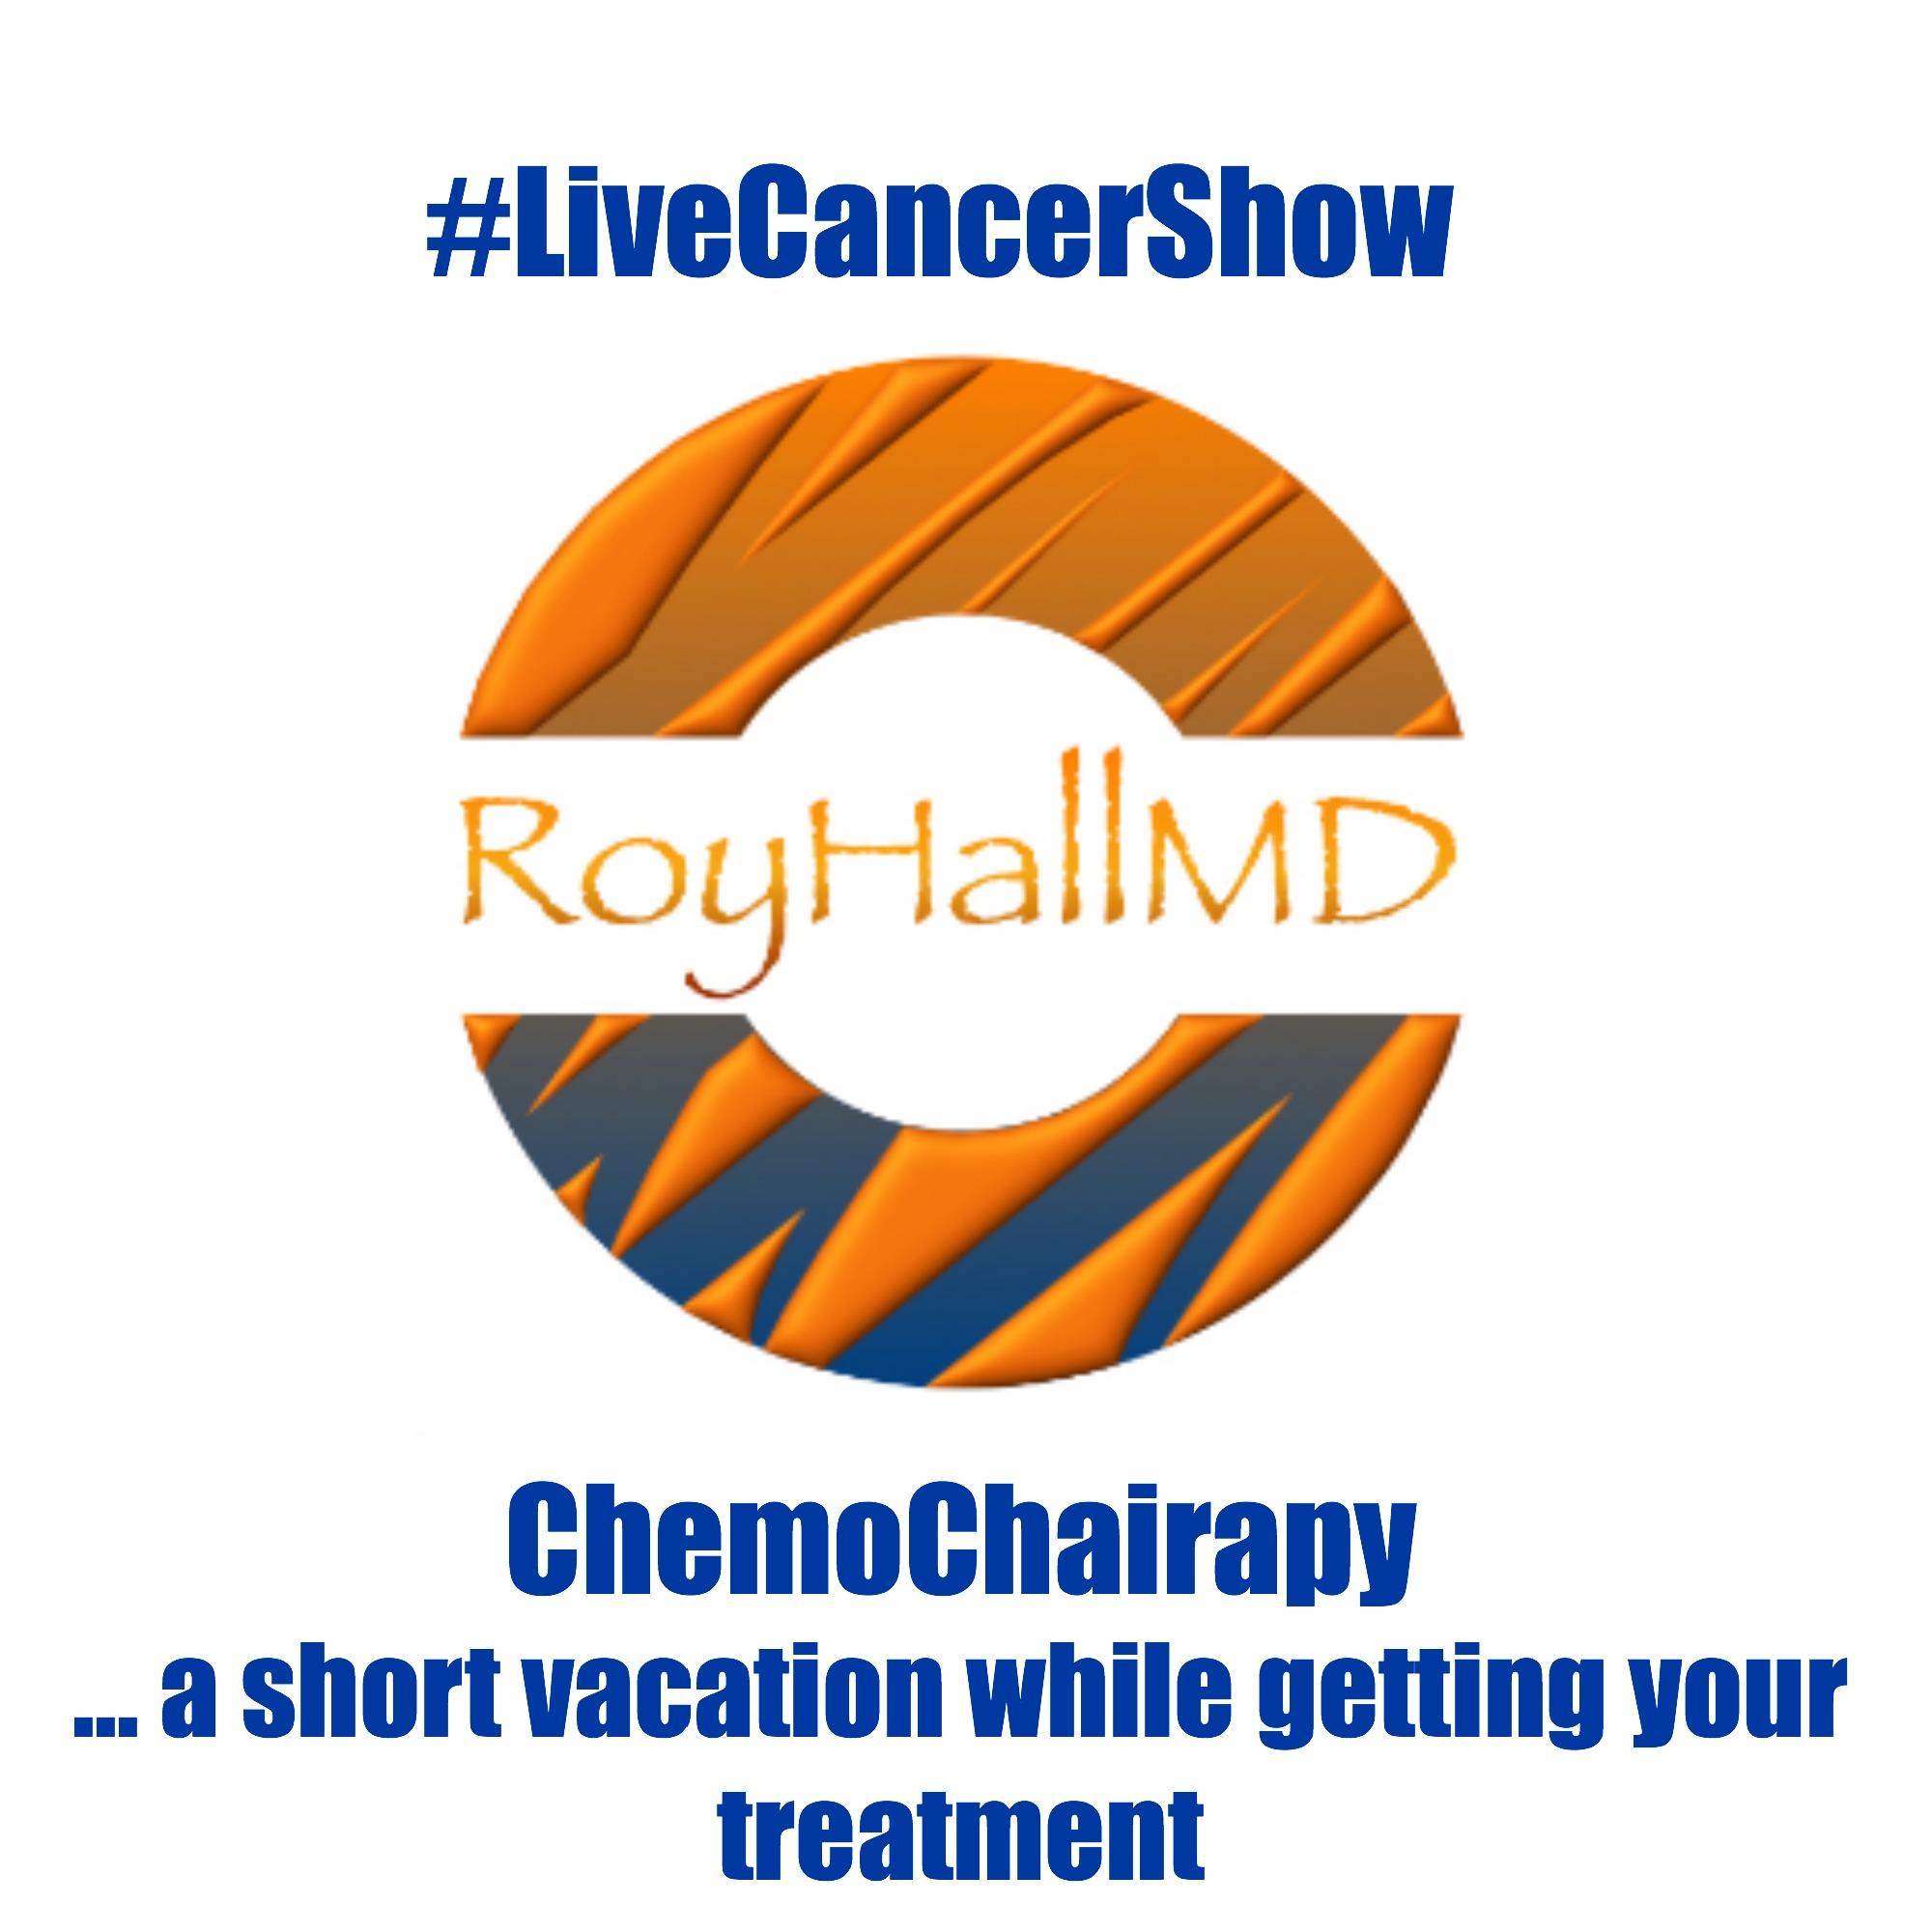 #Chemochairapy